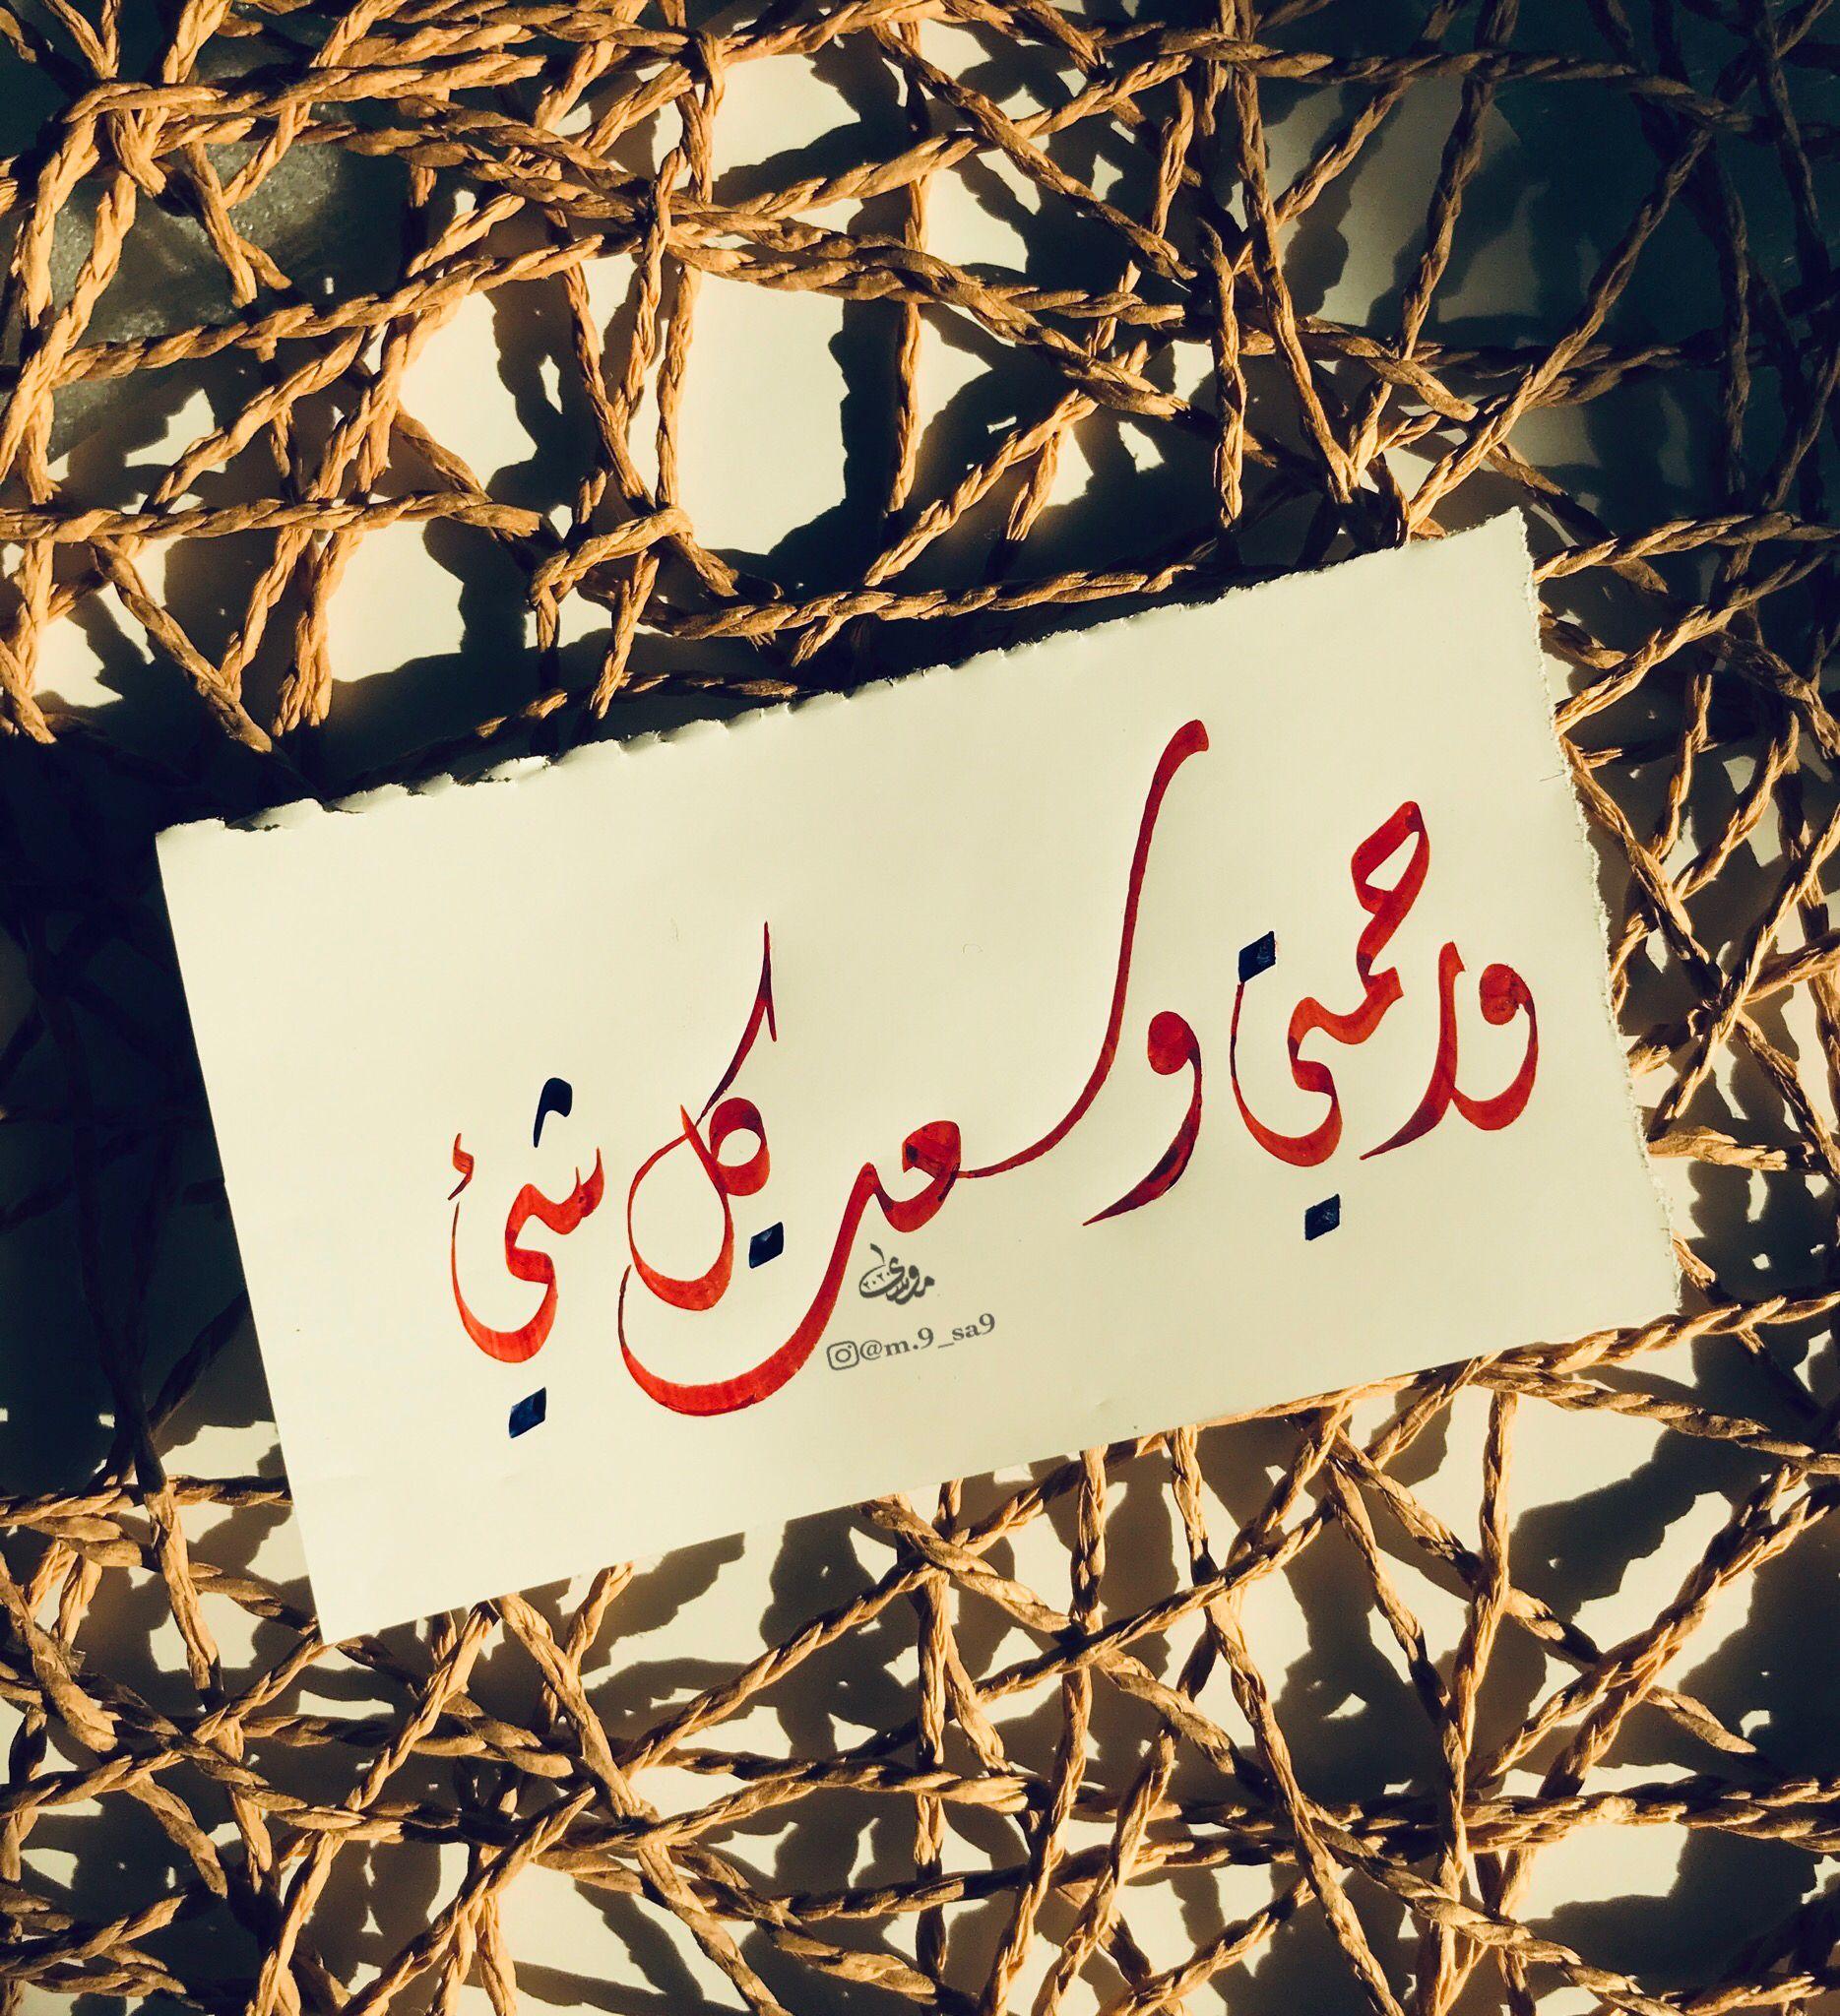 Calligraphy Lifequotes Calligraphyart Art اقوال Artwork Quotes حكم Arabiccalligraphy Poetryquotes رمزيات Arabic رمضان ك In 2020 Novelty Sign Decor Art